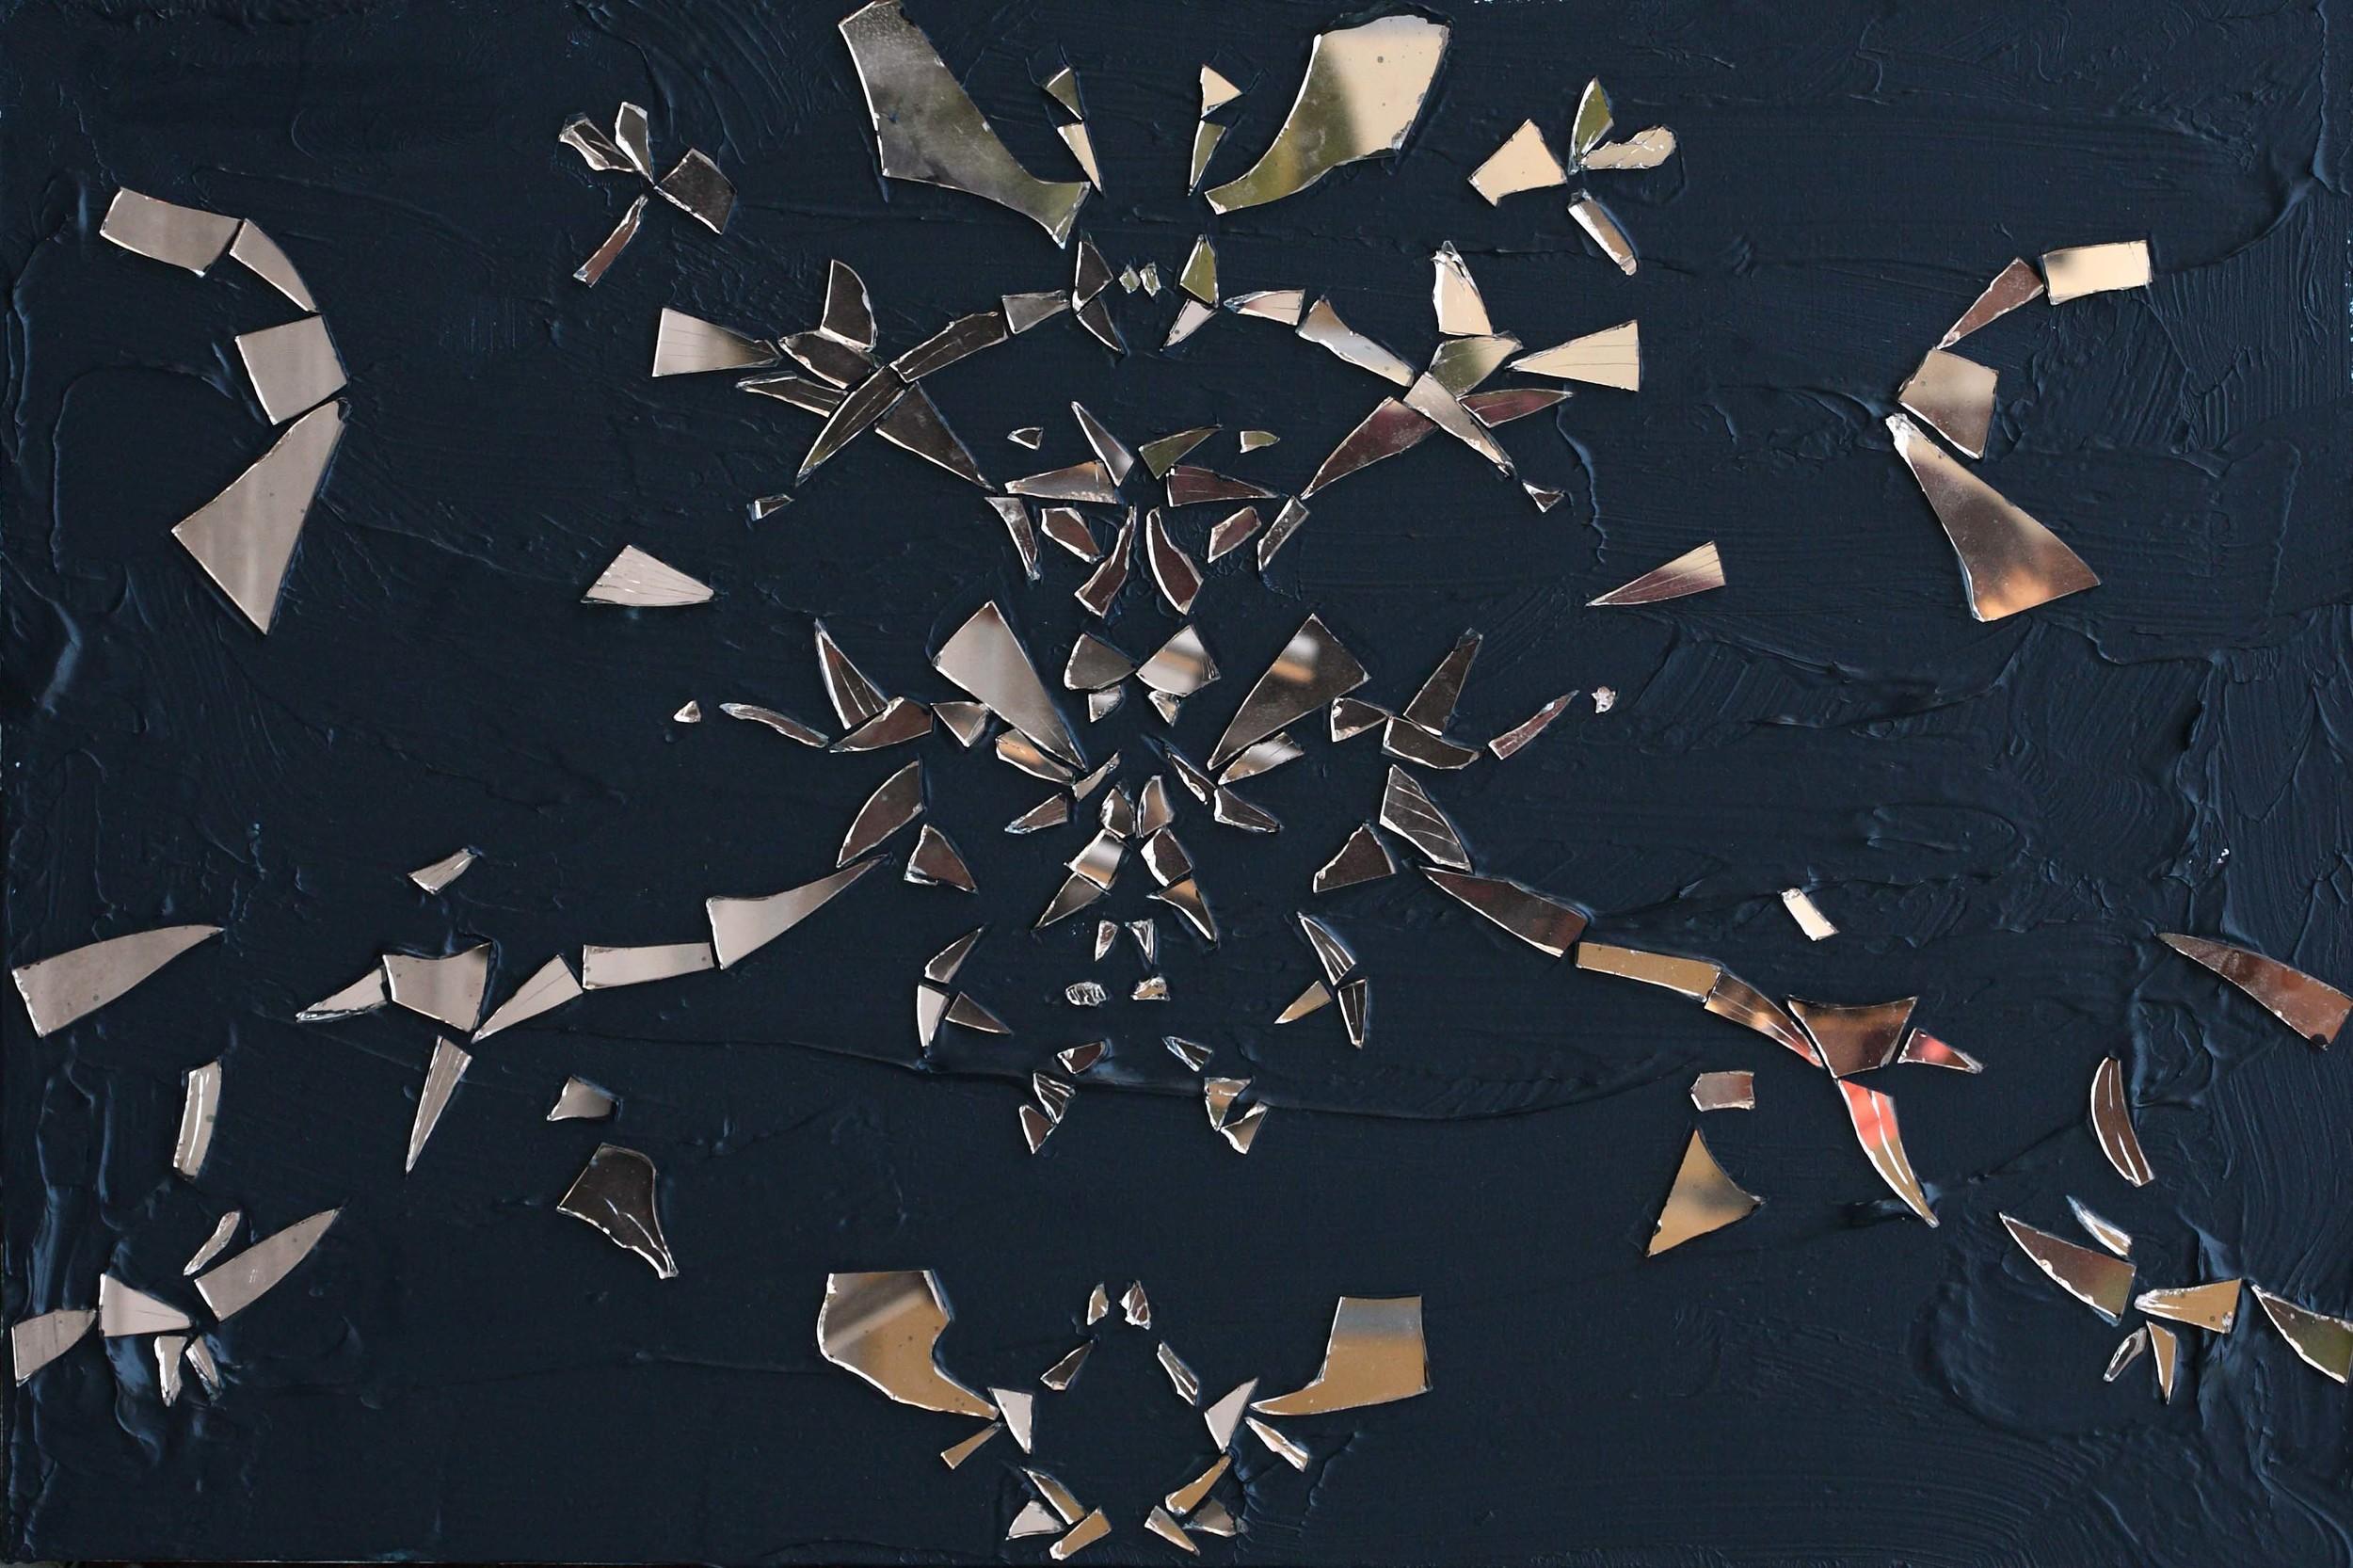 Gao Weigang 高伟刚, Vice 恶习, 2012, Acrylic on canvas and mirror 布面丙烯、镜子, 60 x 90 cm